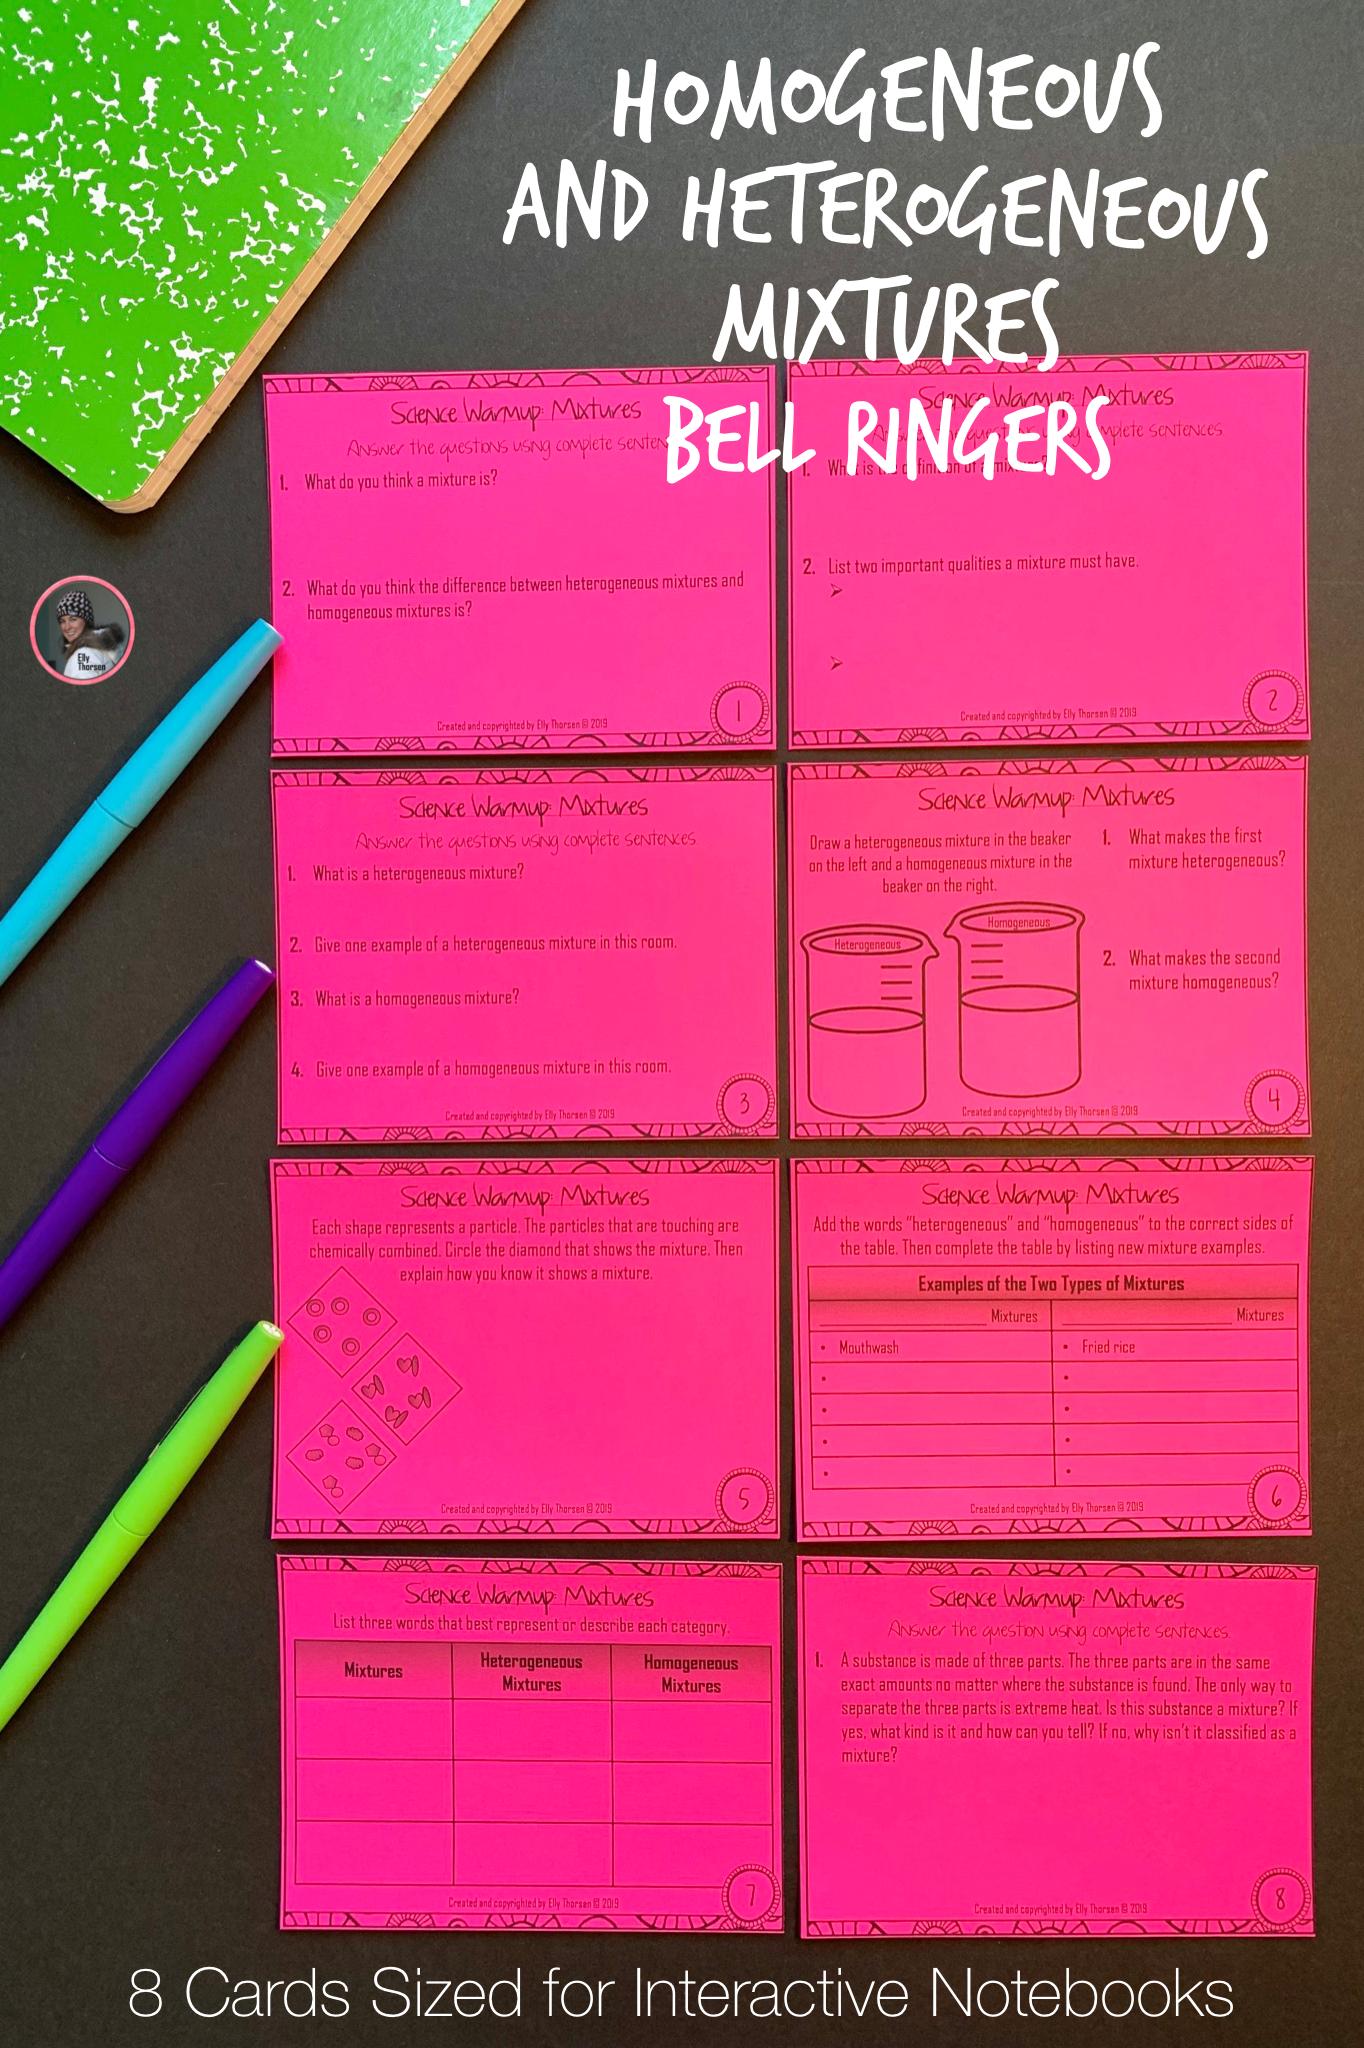 Heterogeneous And Homogeneous Mixtures Bell Ringers Or